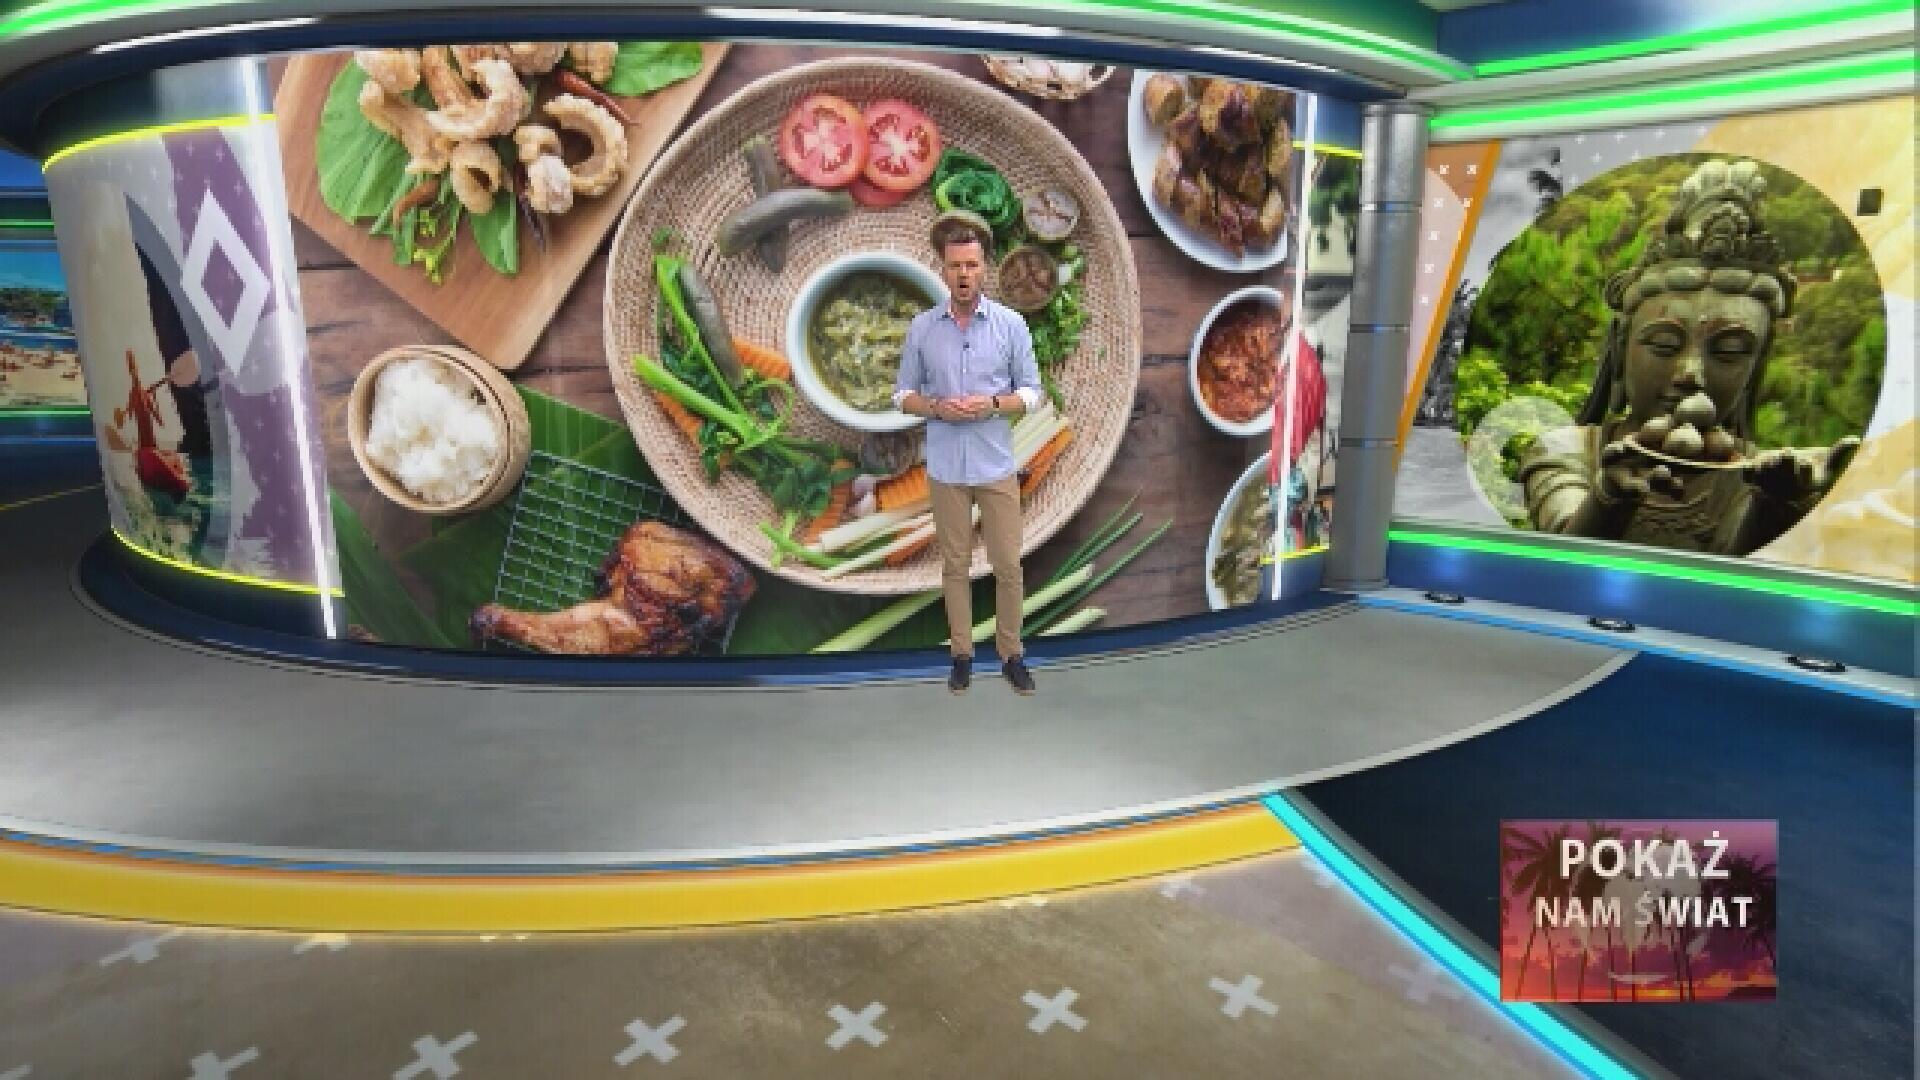 Tajlandia Od Kuchni Pascal Brodnicki Radzi Co Warto Zjeść